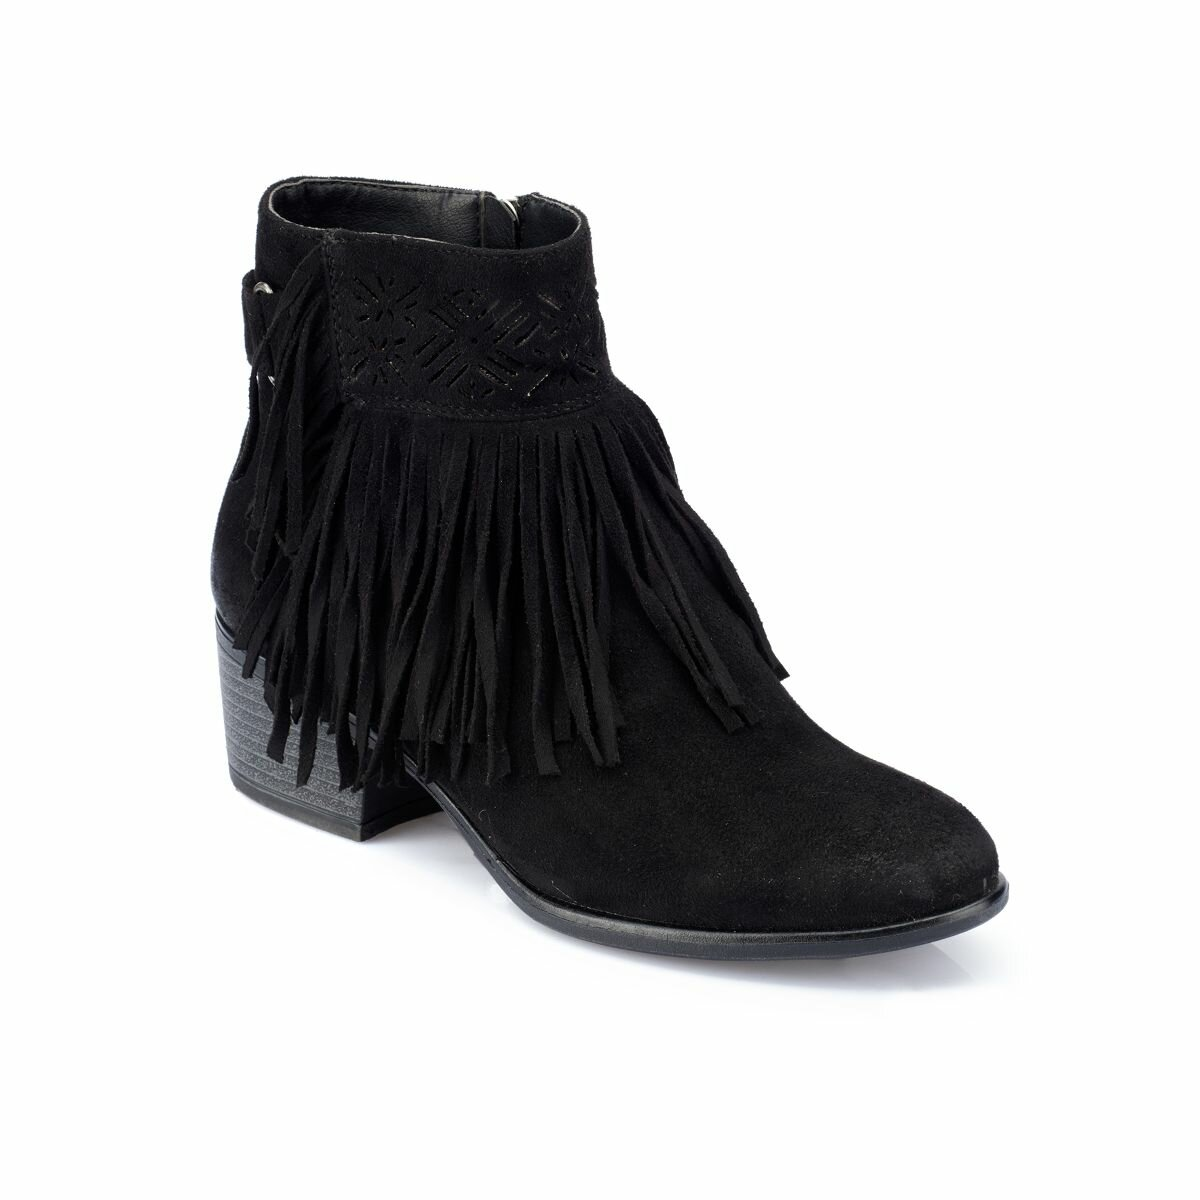 FLO 82.312260.Z Black Women Boots Polaris